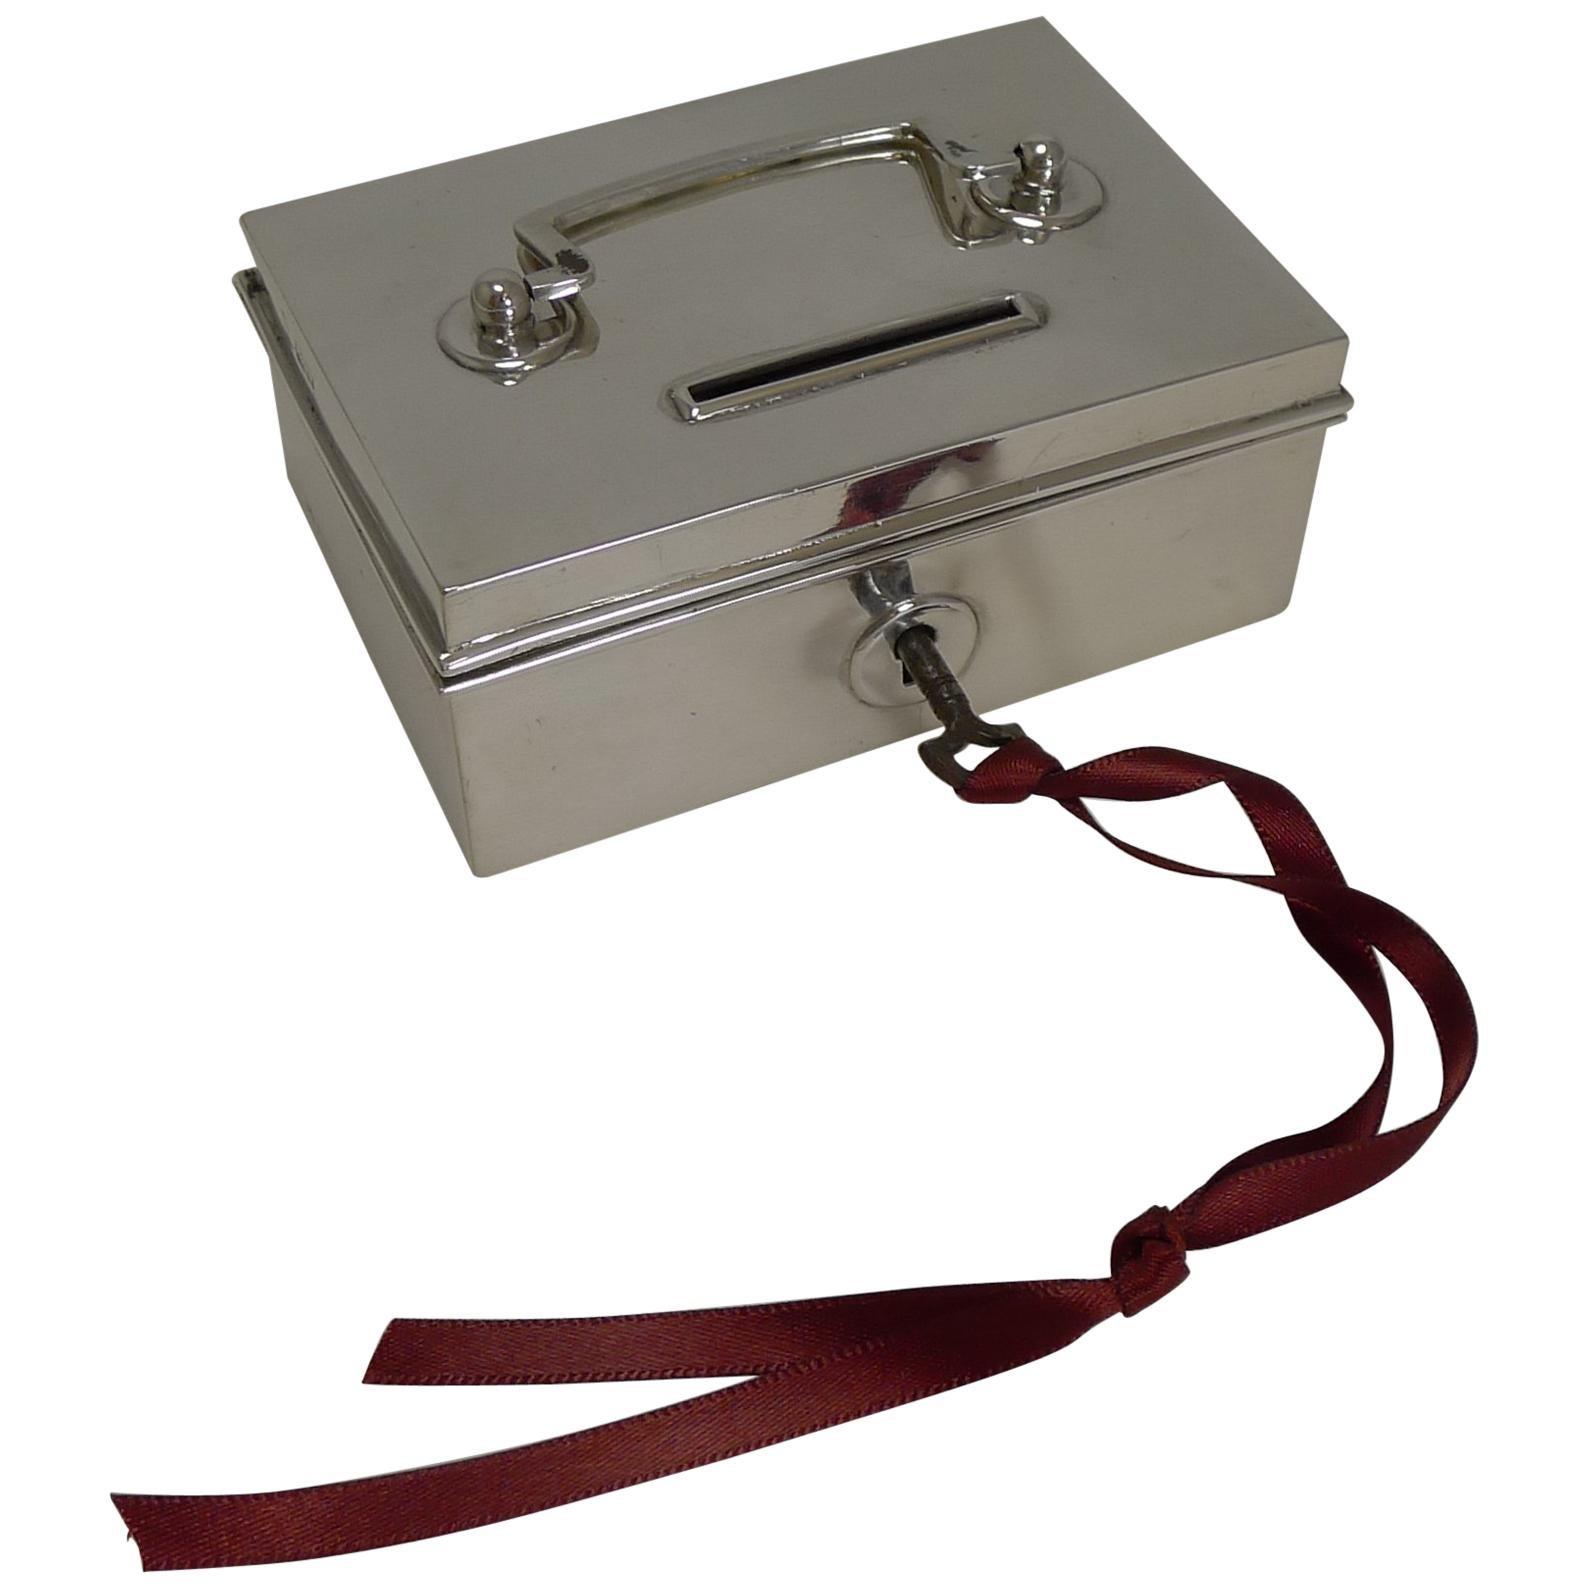 Rare Novelty English Sterling Silver Money Box / Bank, Miniature Cash Box